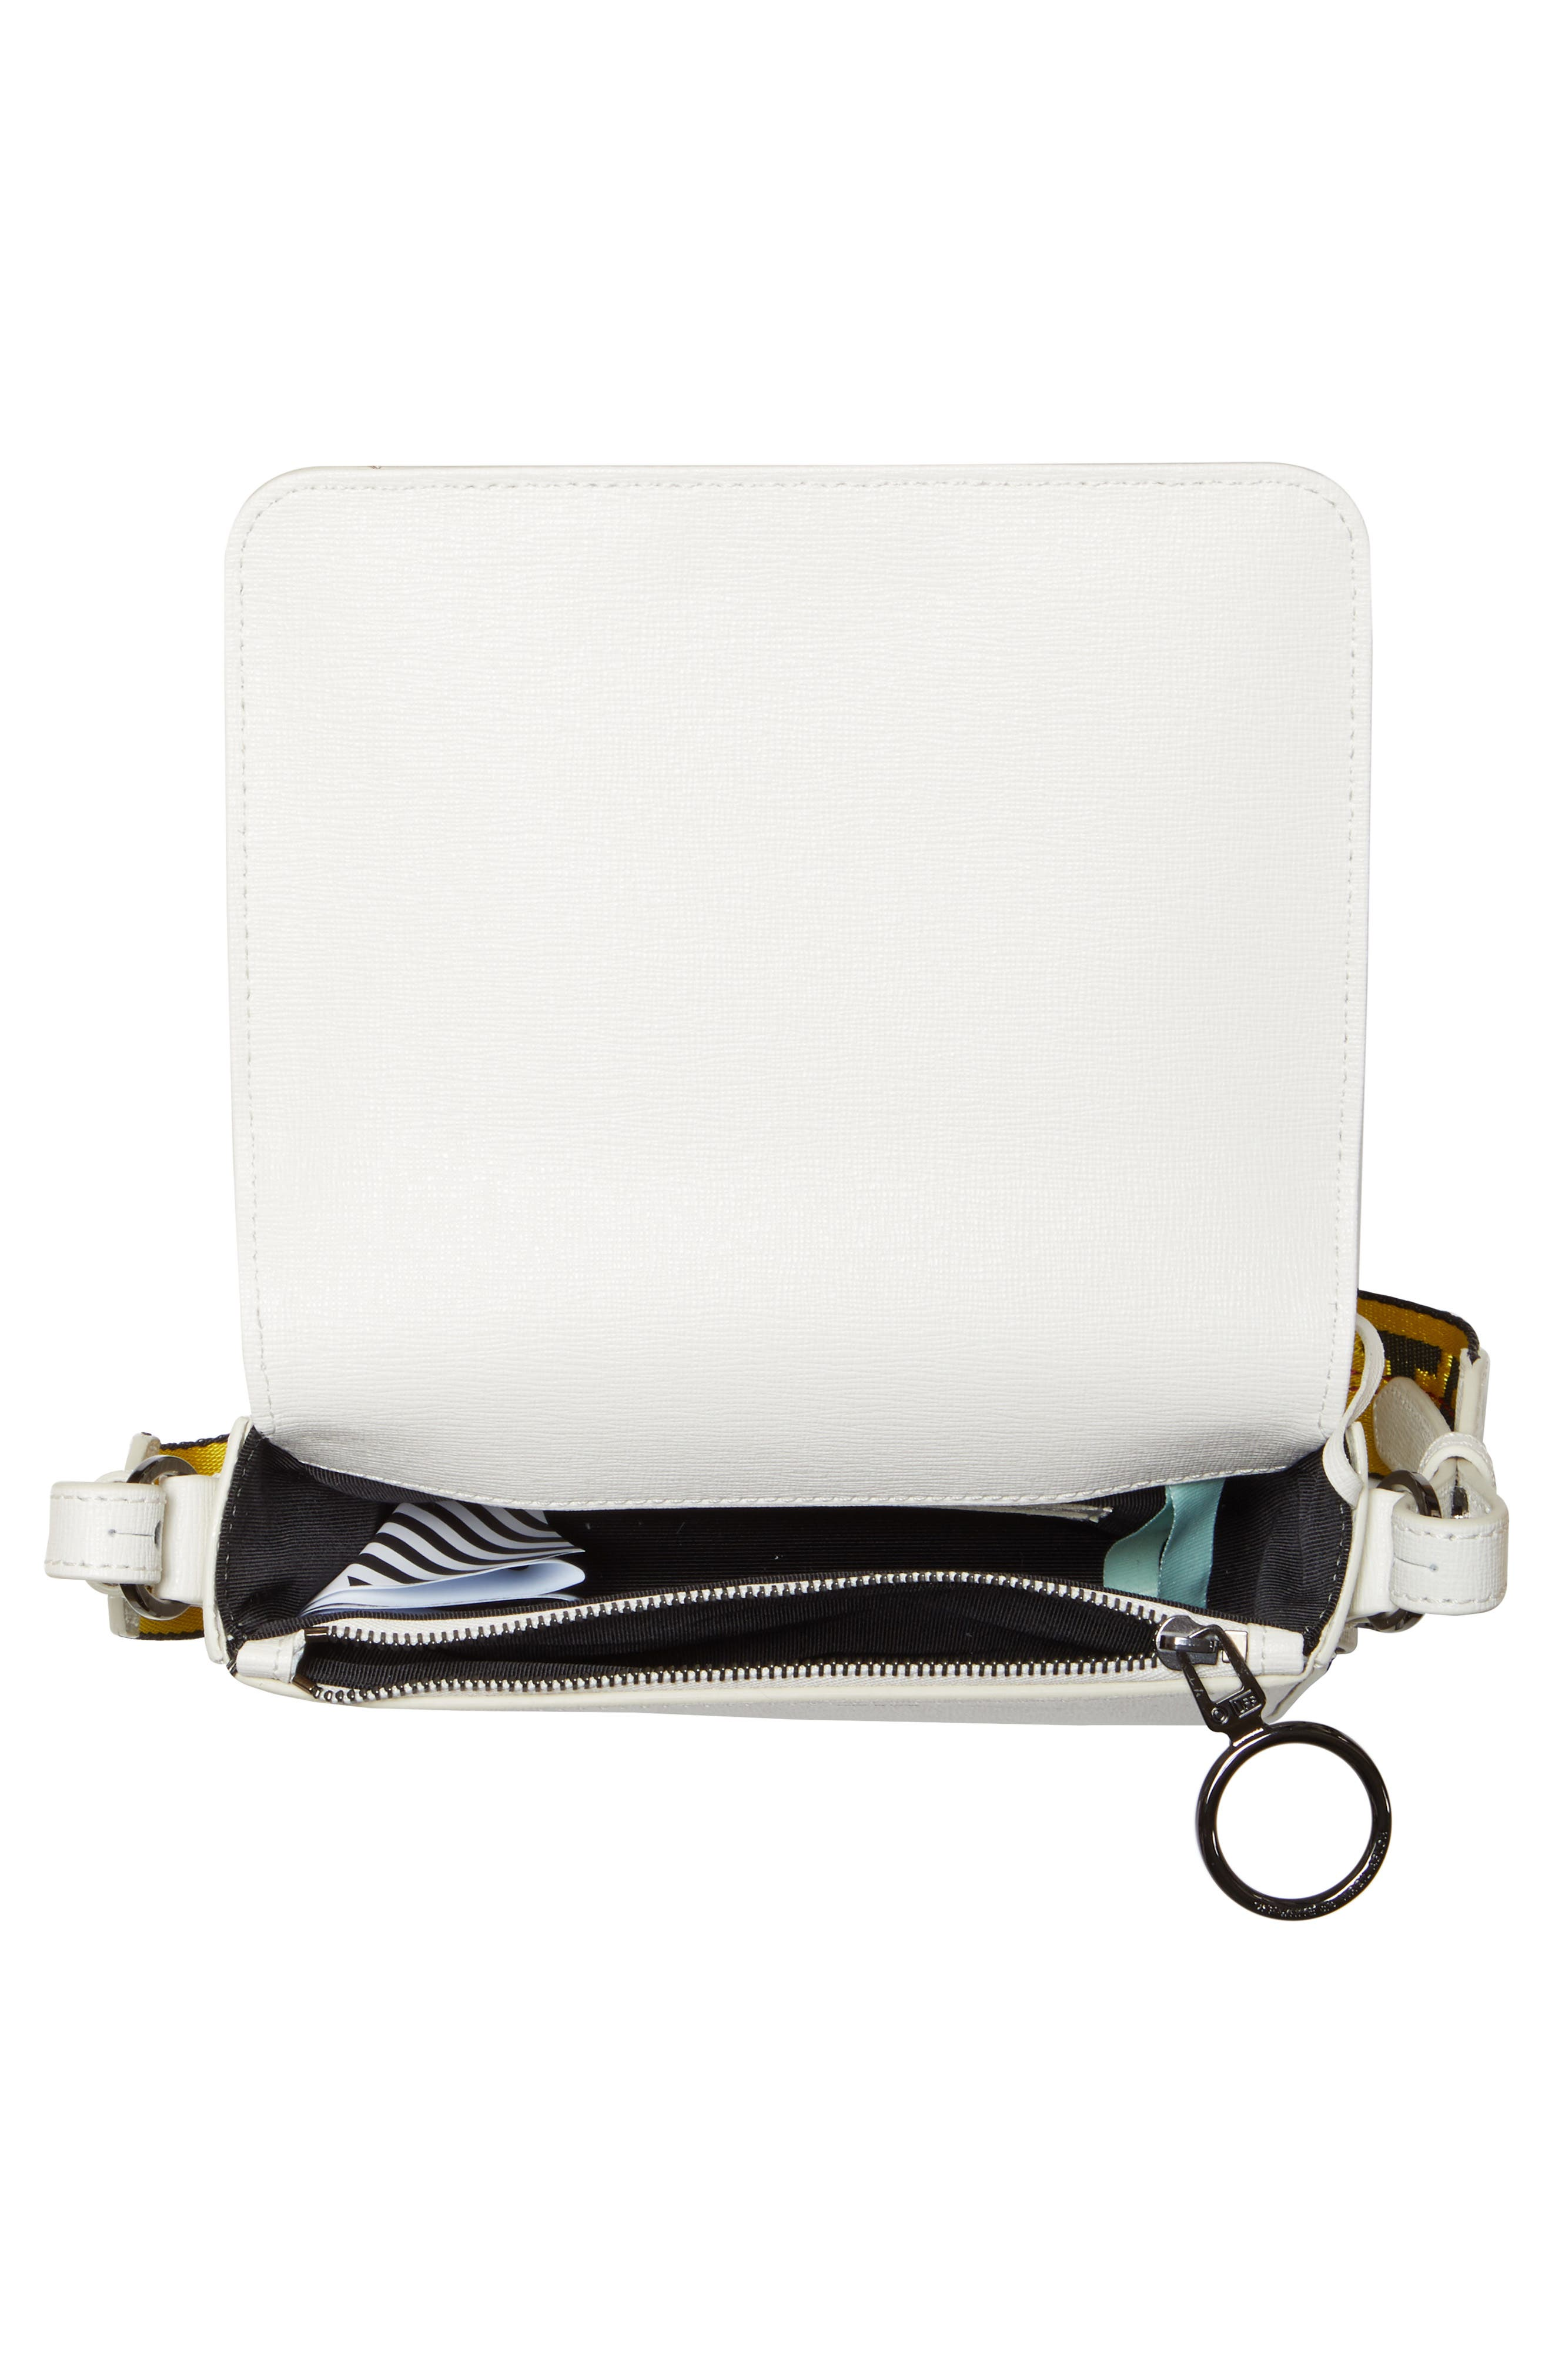 Mini Leather Flap Bag,                             Alternate thumbnail 4, color,                             WHITE NO COLOR